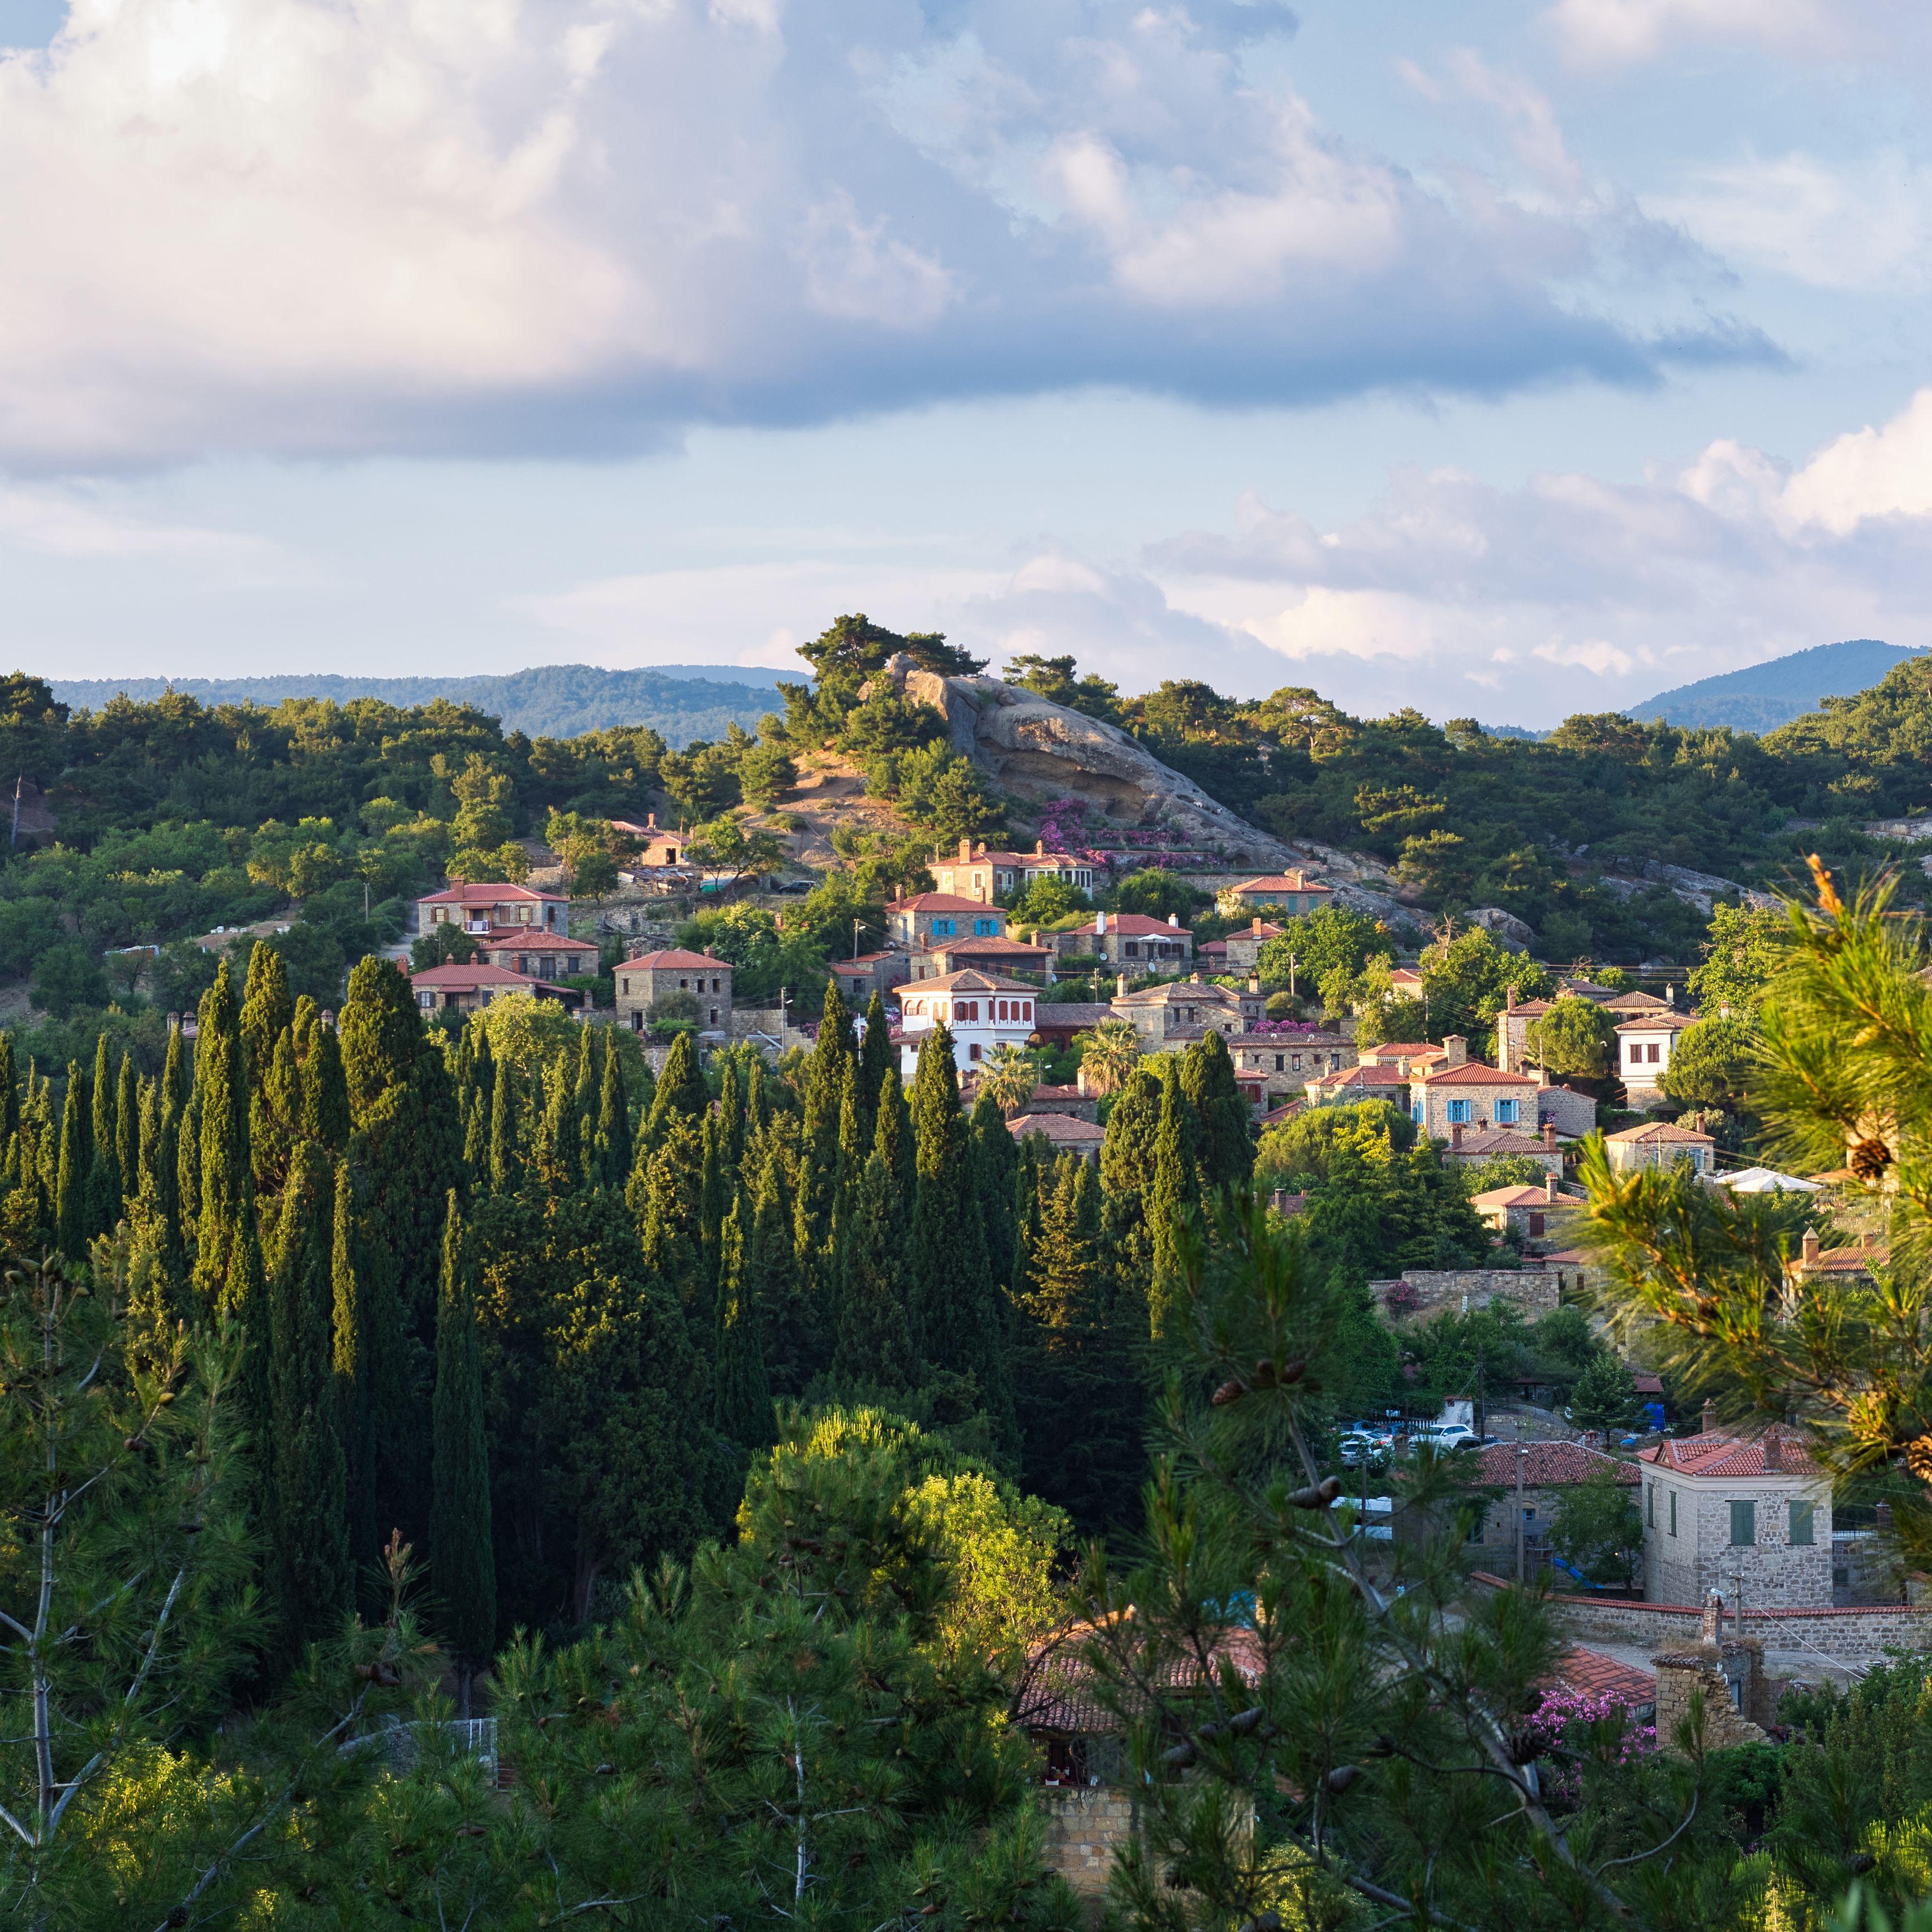 3415x3415 Wallpaper village, mountain, buildings, trees